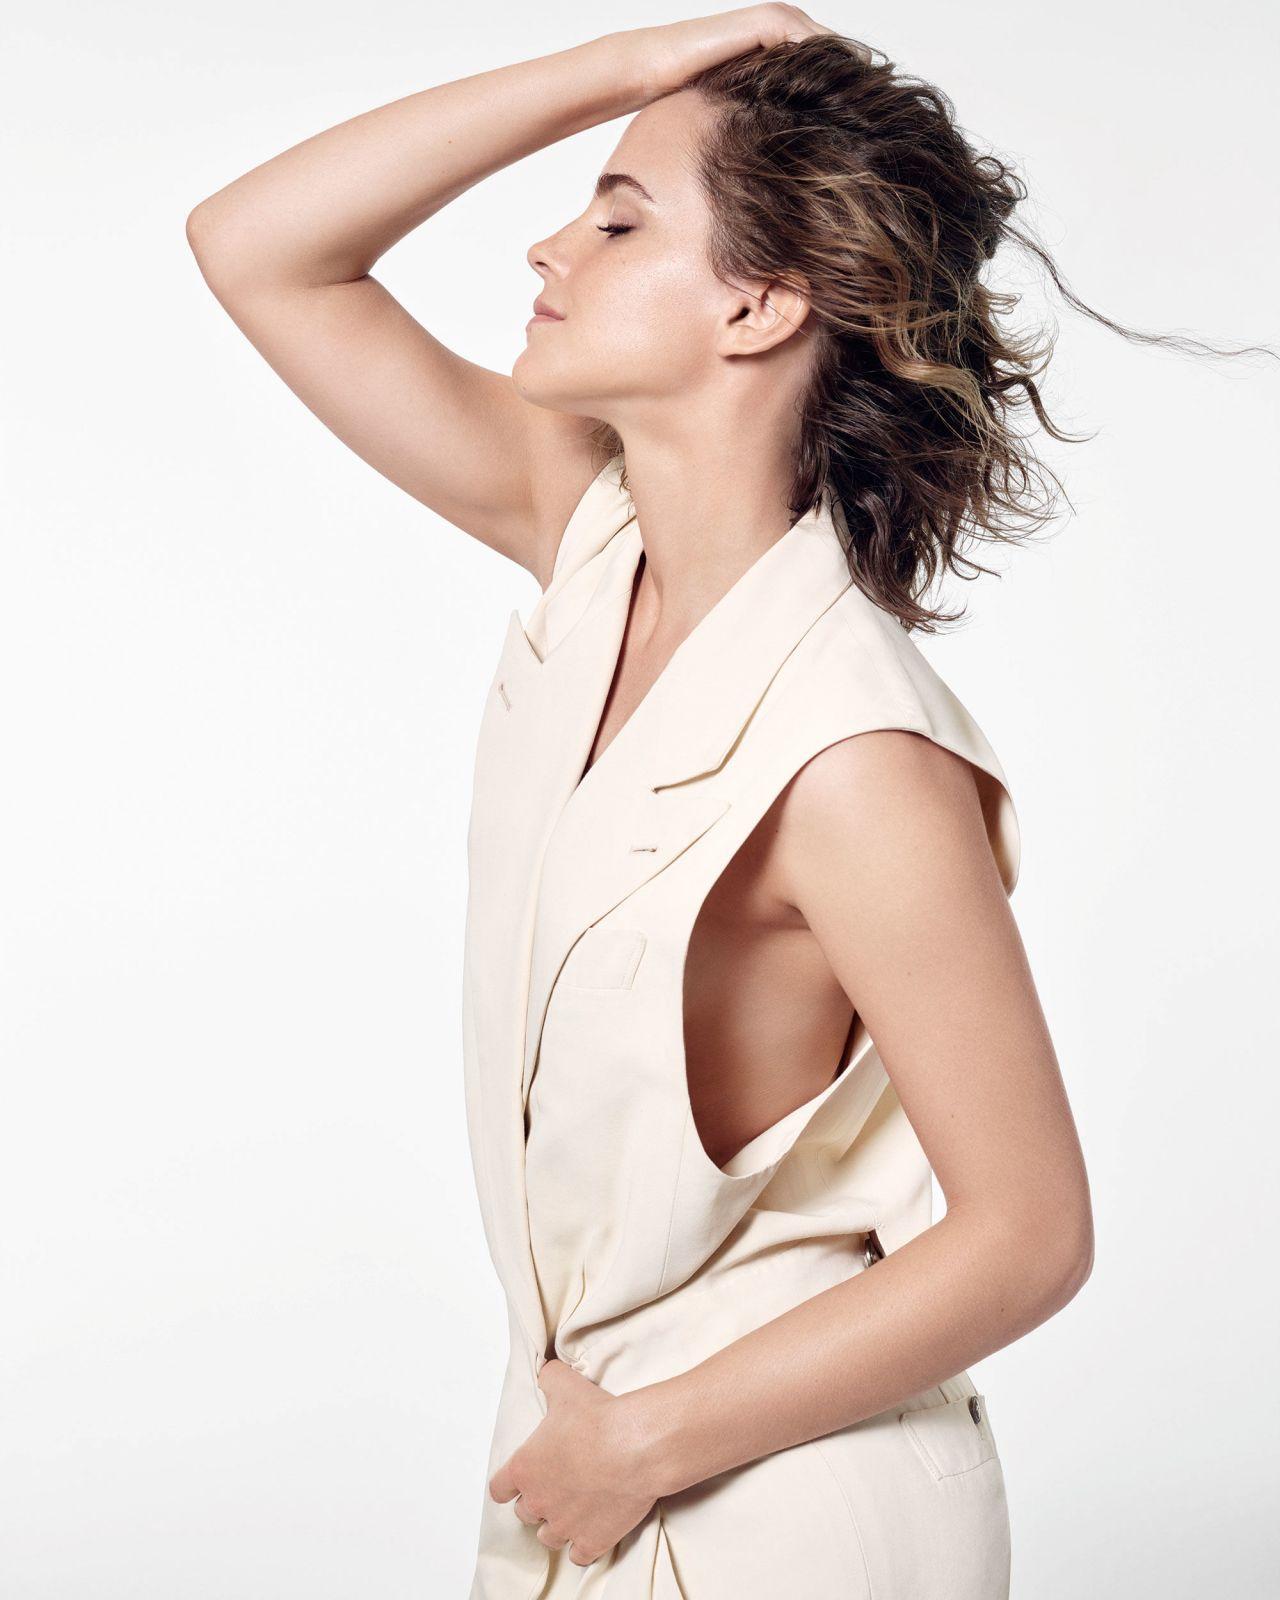 Emma Watson - Elle UK, March 2017 Cover and Photos Emma Watson